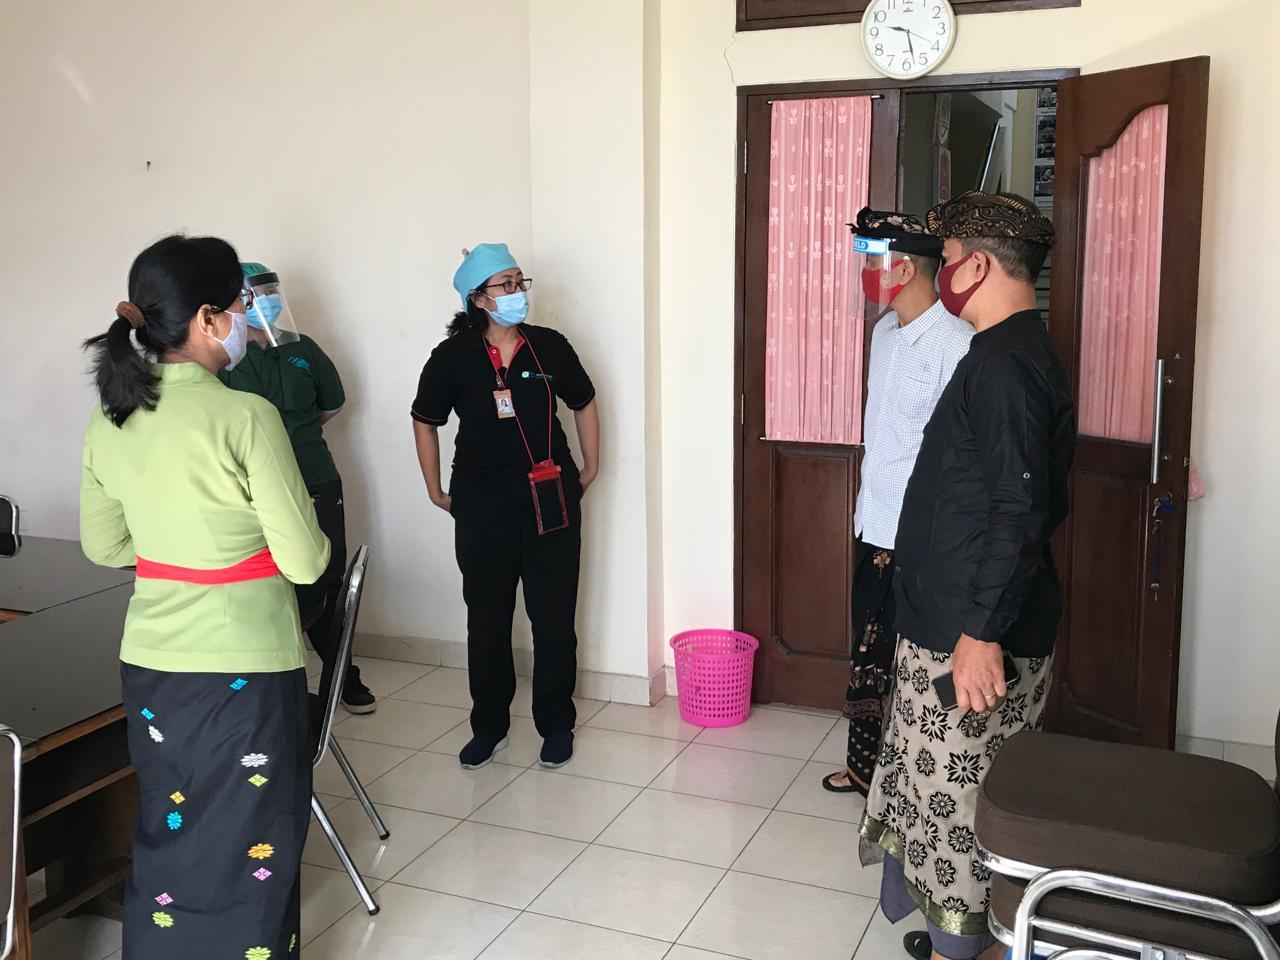 PETUGAS kesehatan dari Puskesmas Dentim saat meninjau ruangan untuk tes cepat jajaran KPU Denpasar, Kamis (11/6/2020). Foto: gus hendra